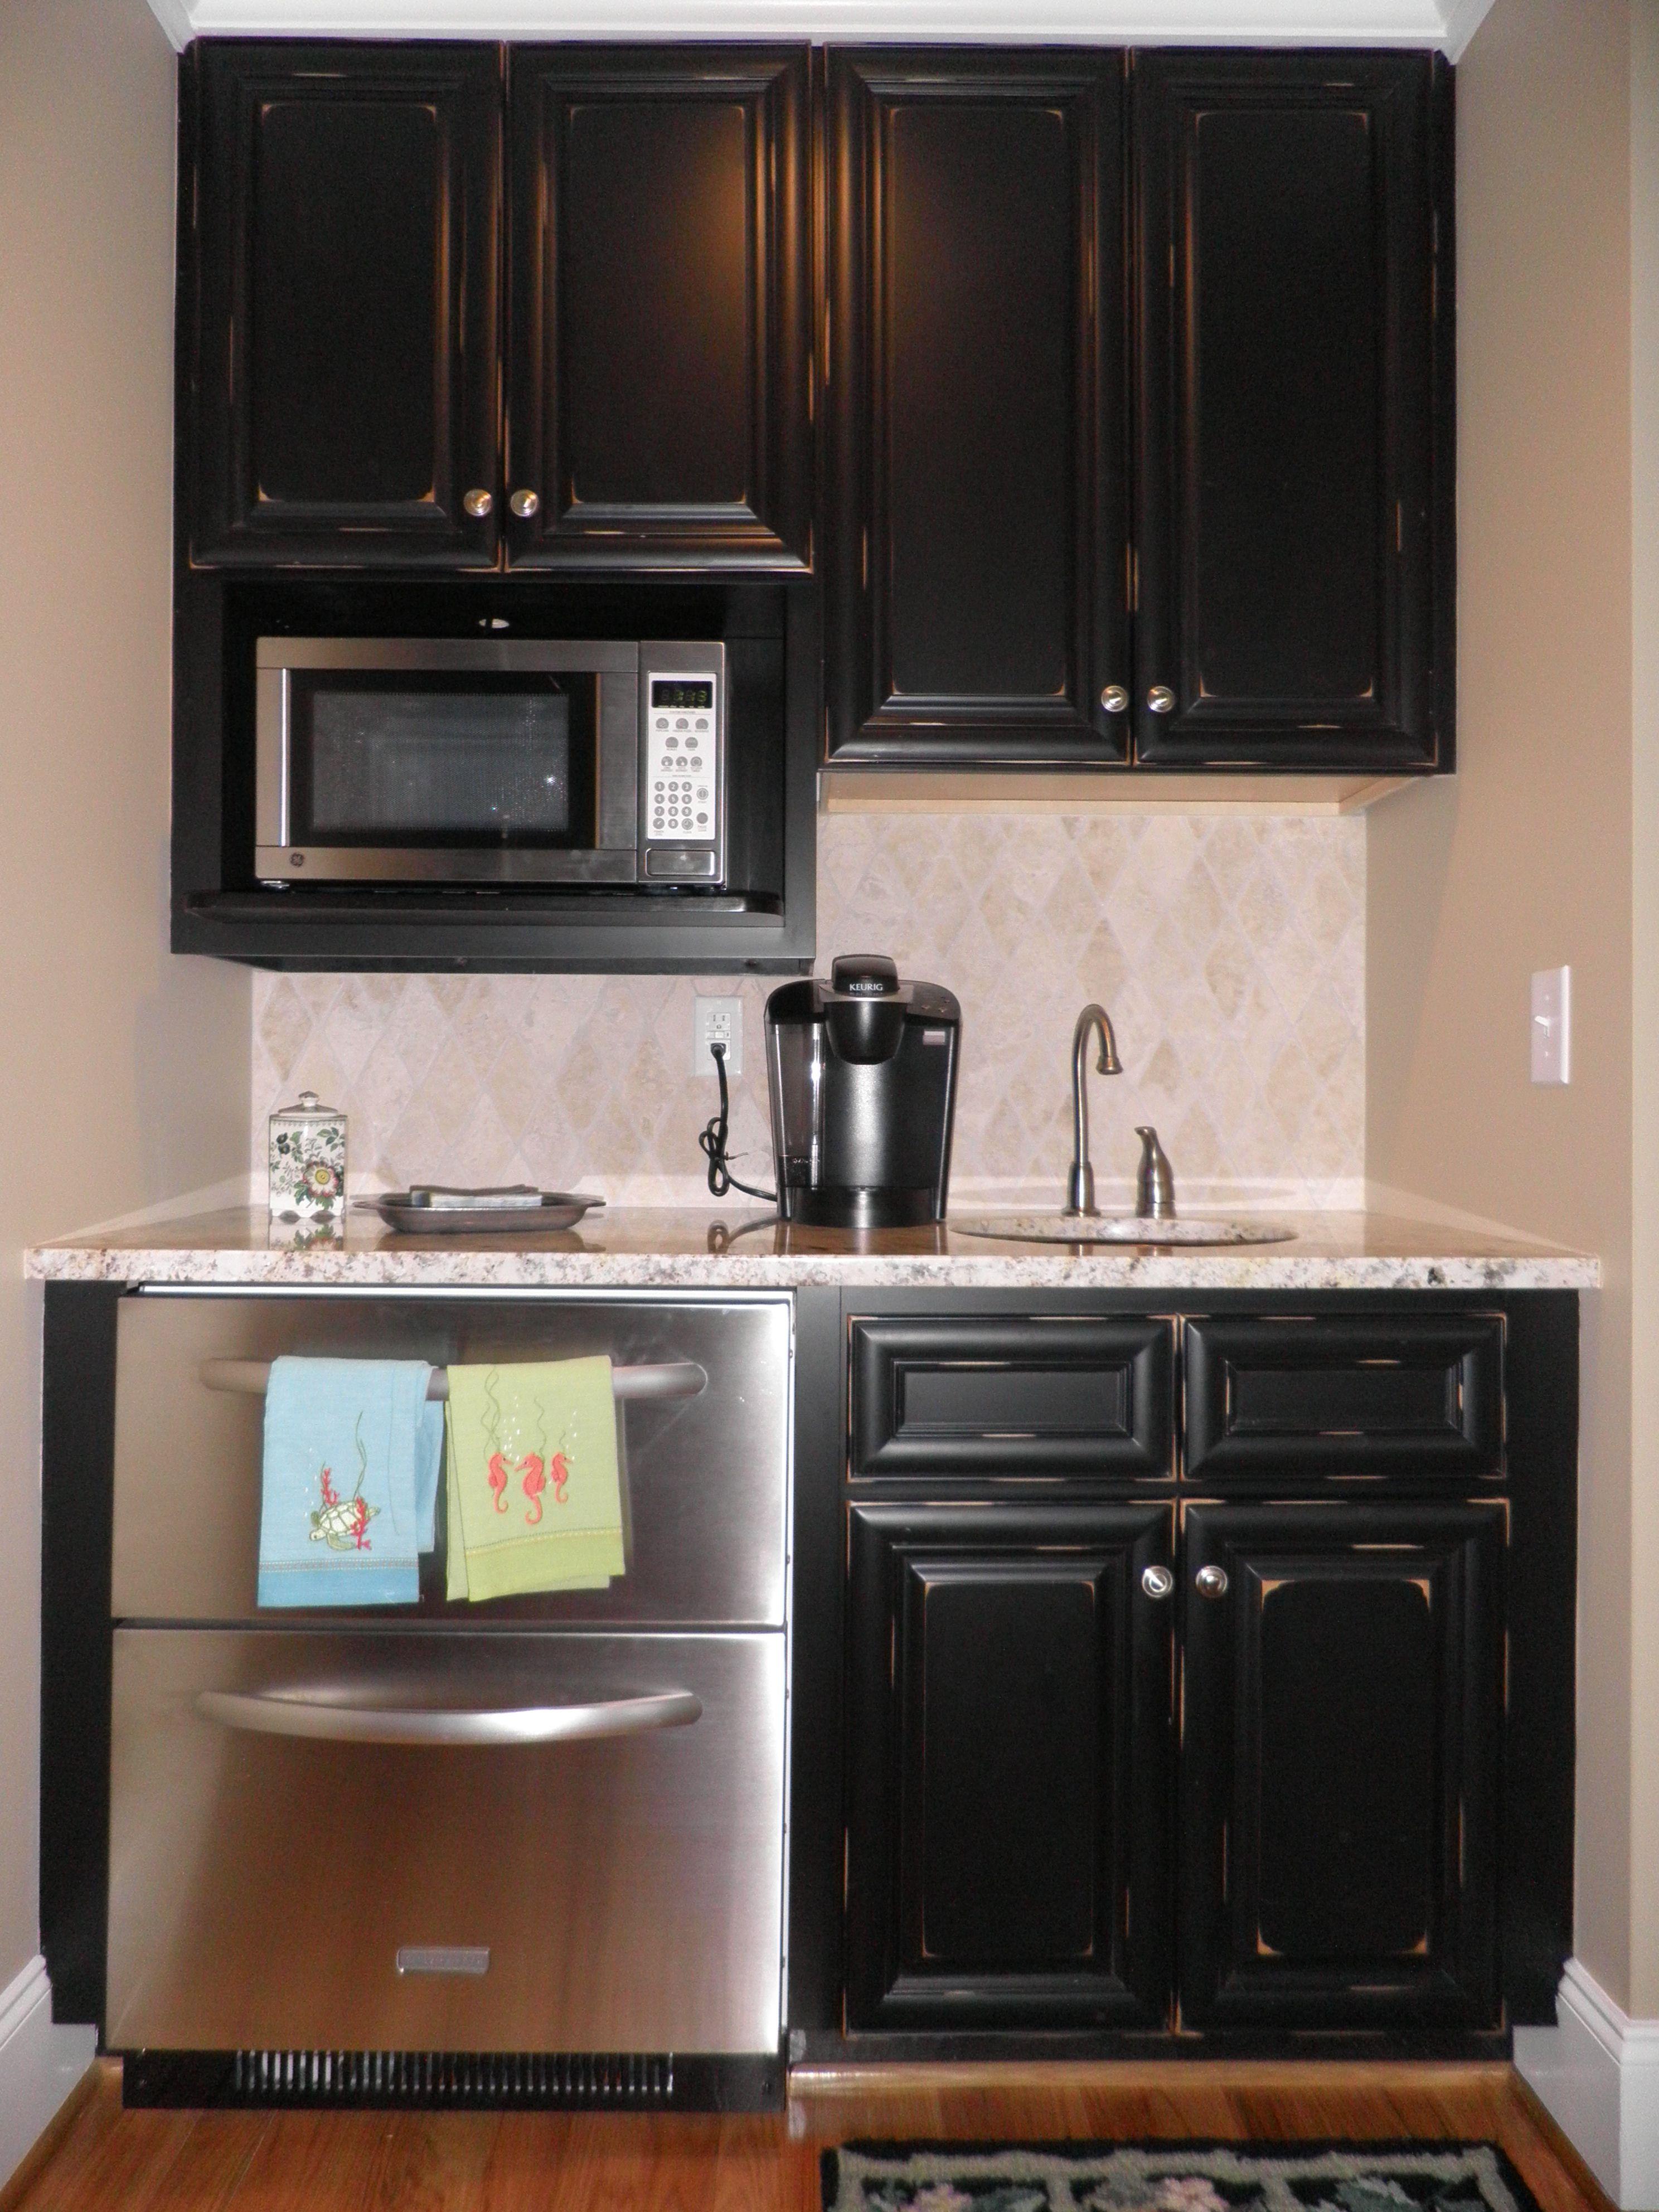 Vintage Onyx Tiny Kitchen It Works Www Ez Cabs Com Distressed Kitchen Cabinets Distressed Kitchen Kitchen Cabinets